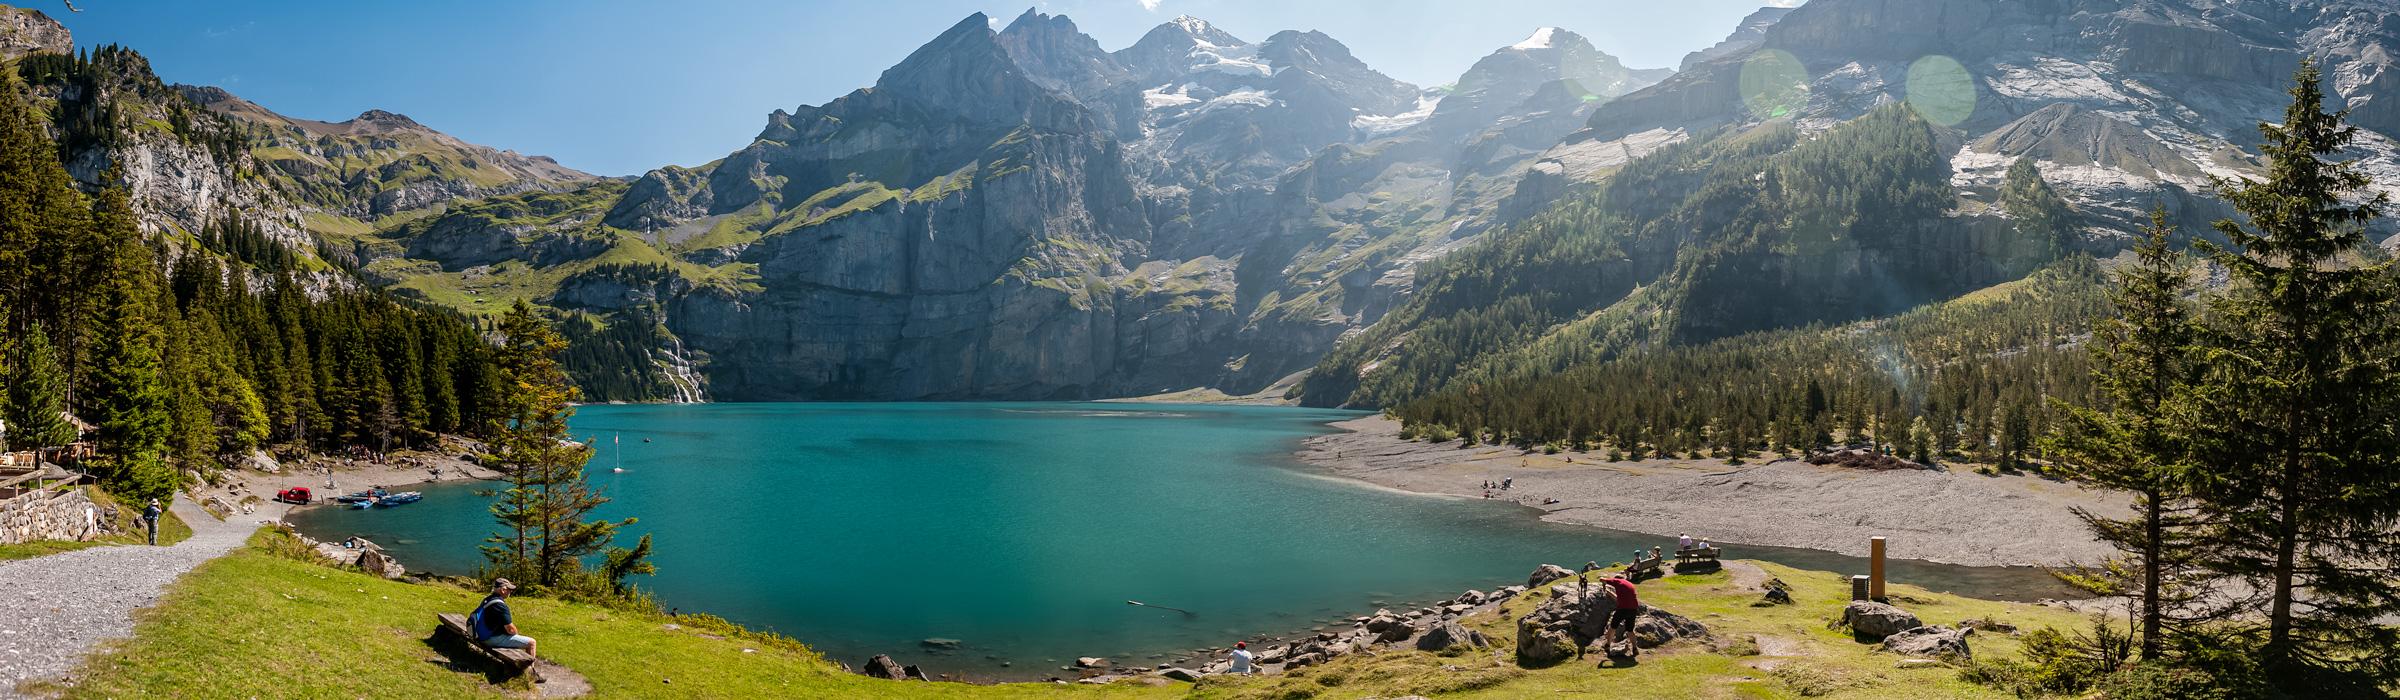 Panoramaufnahme Schweiz